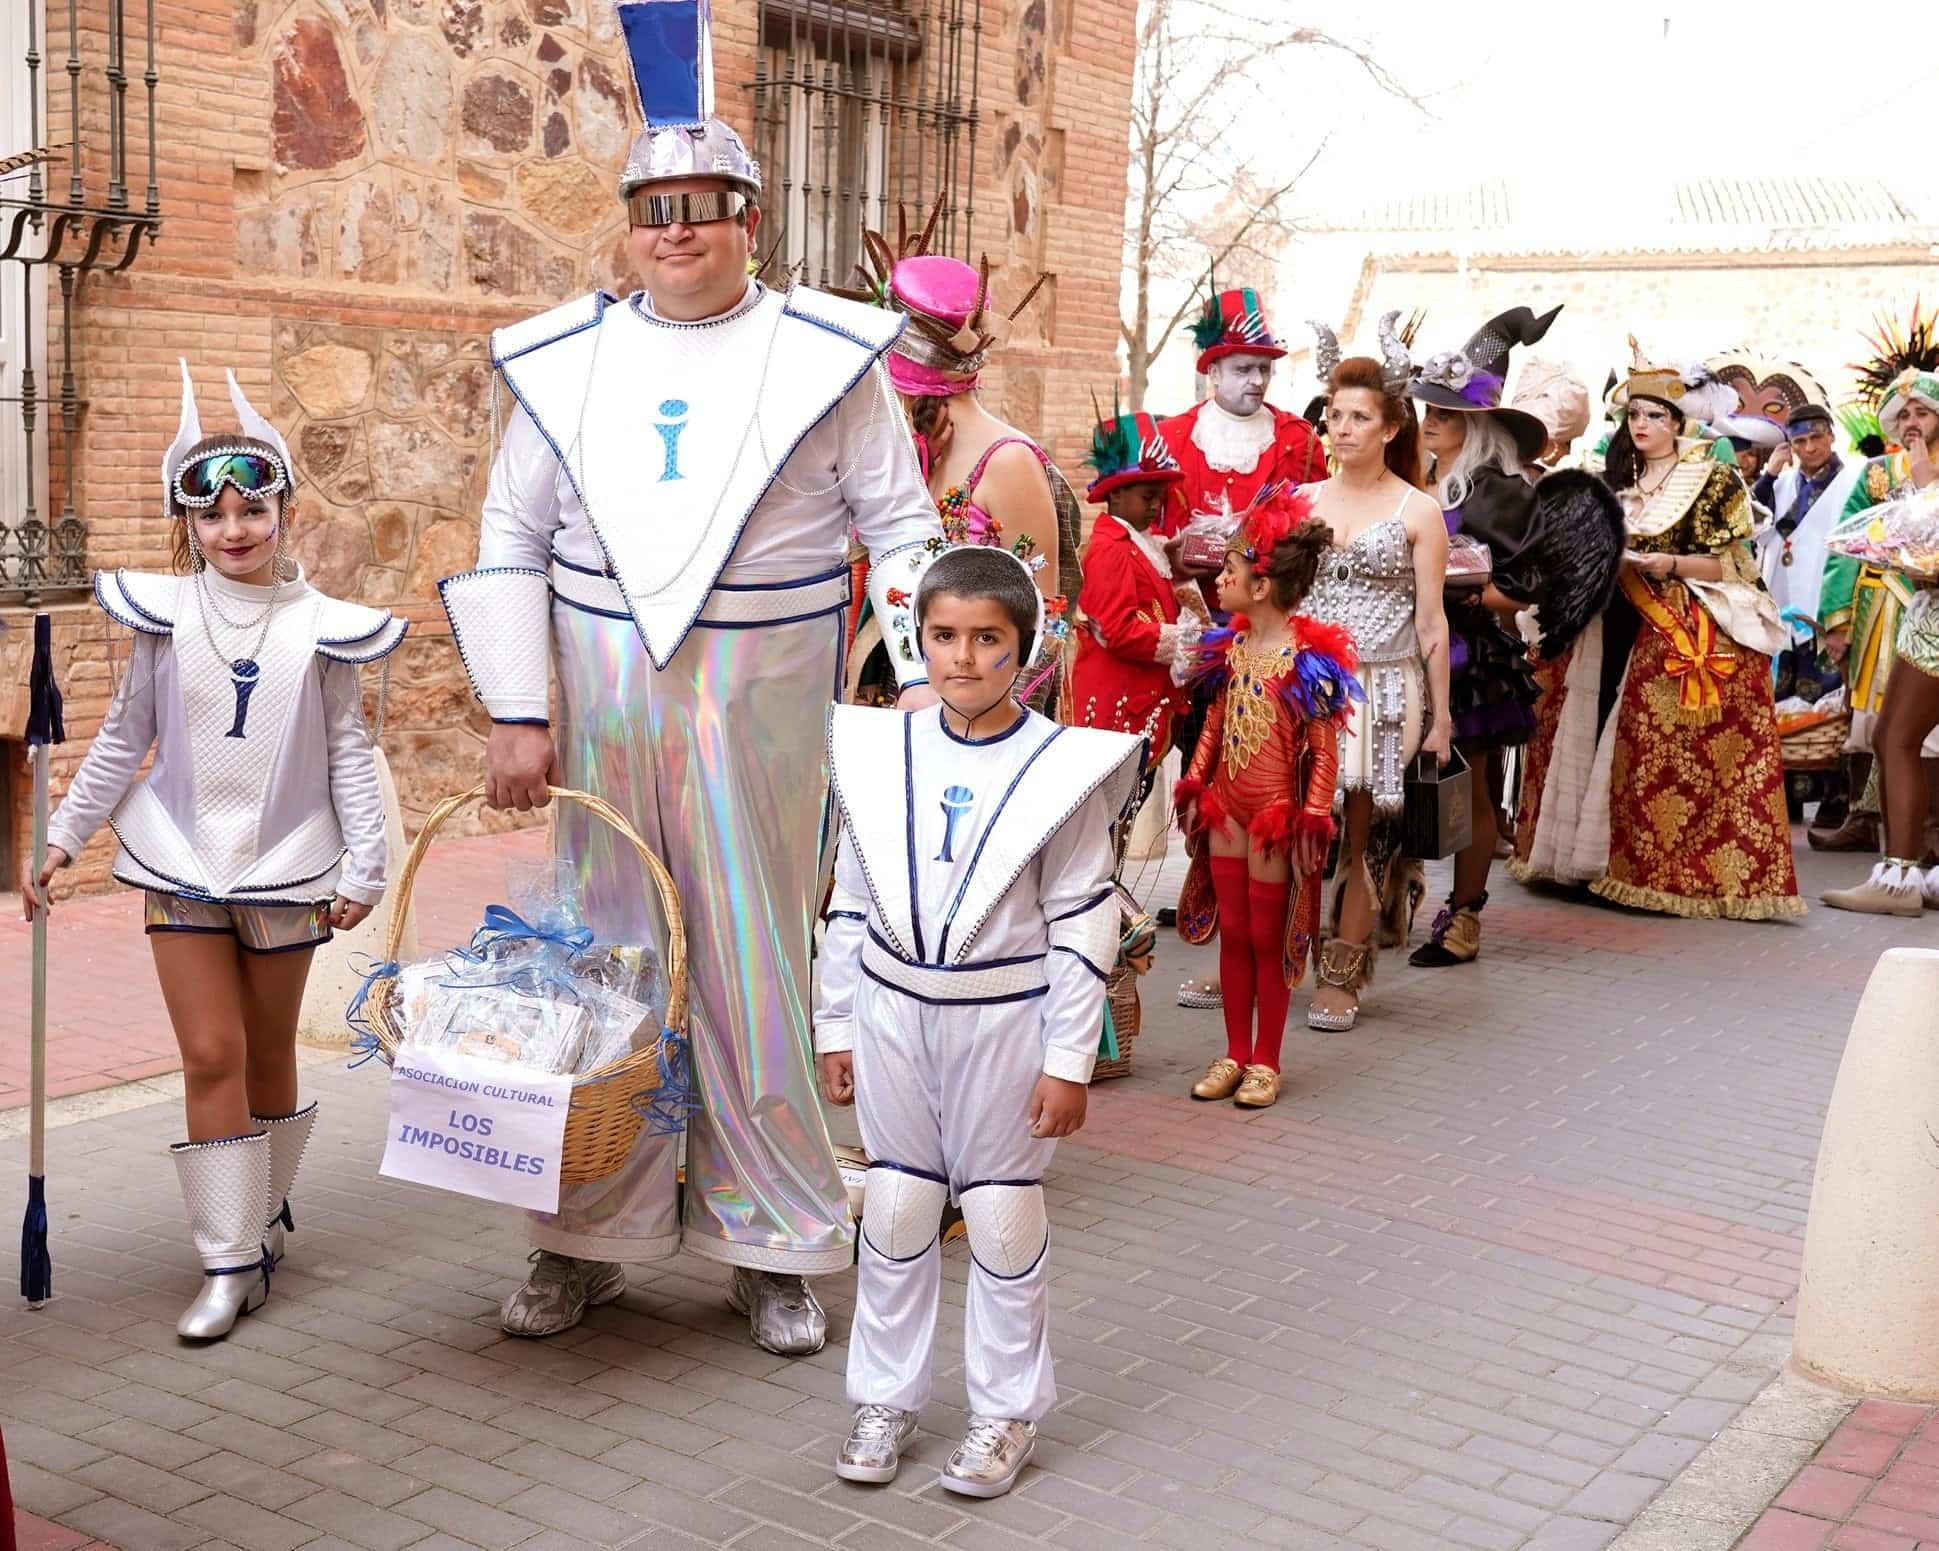 Carnaval de herencia 2020 ofertorio 59 - Selección de fotografías del Ofertorio del Carnaval de Herencia